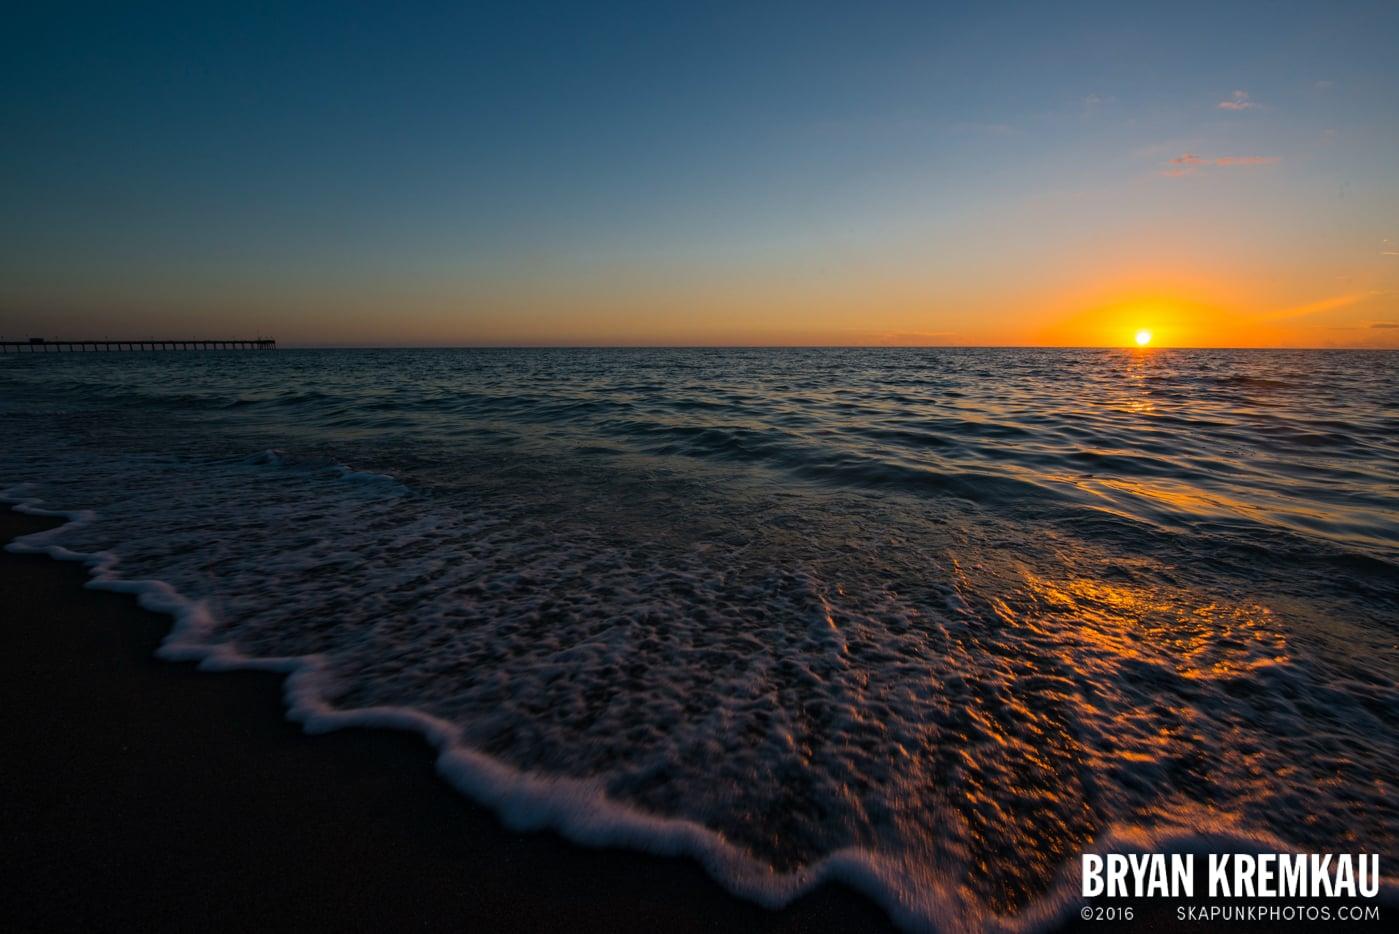 Sunsets, Astrophotography & Birds @ Venice, Florida - 10.25.14 - 11.5.14 (117)